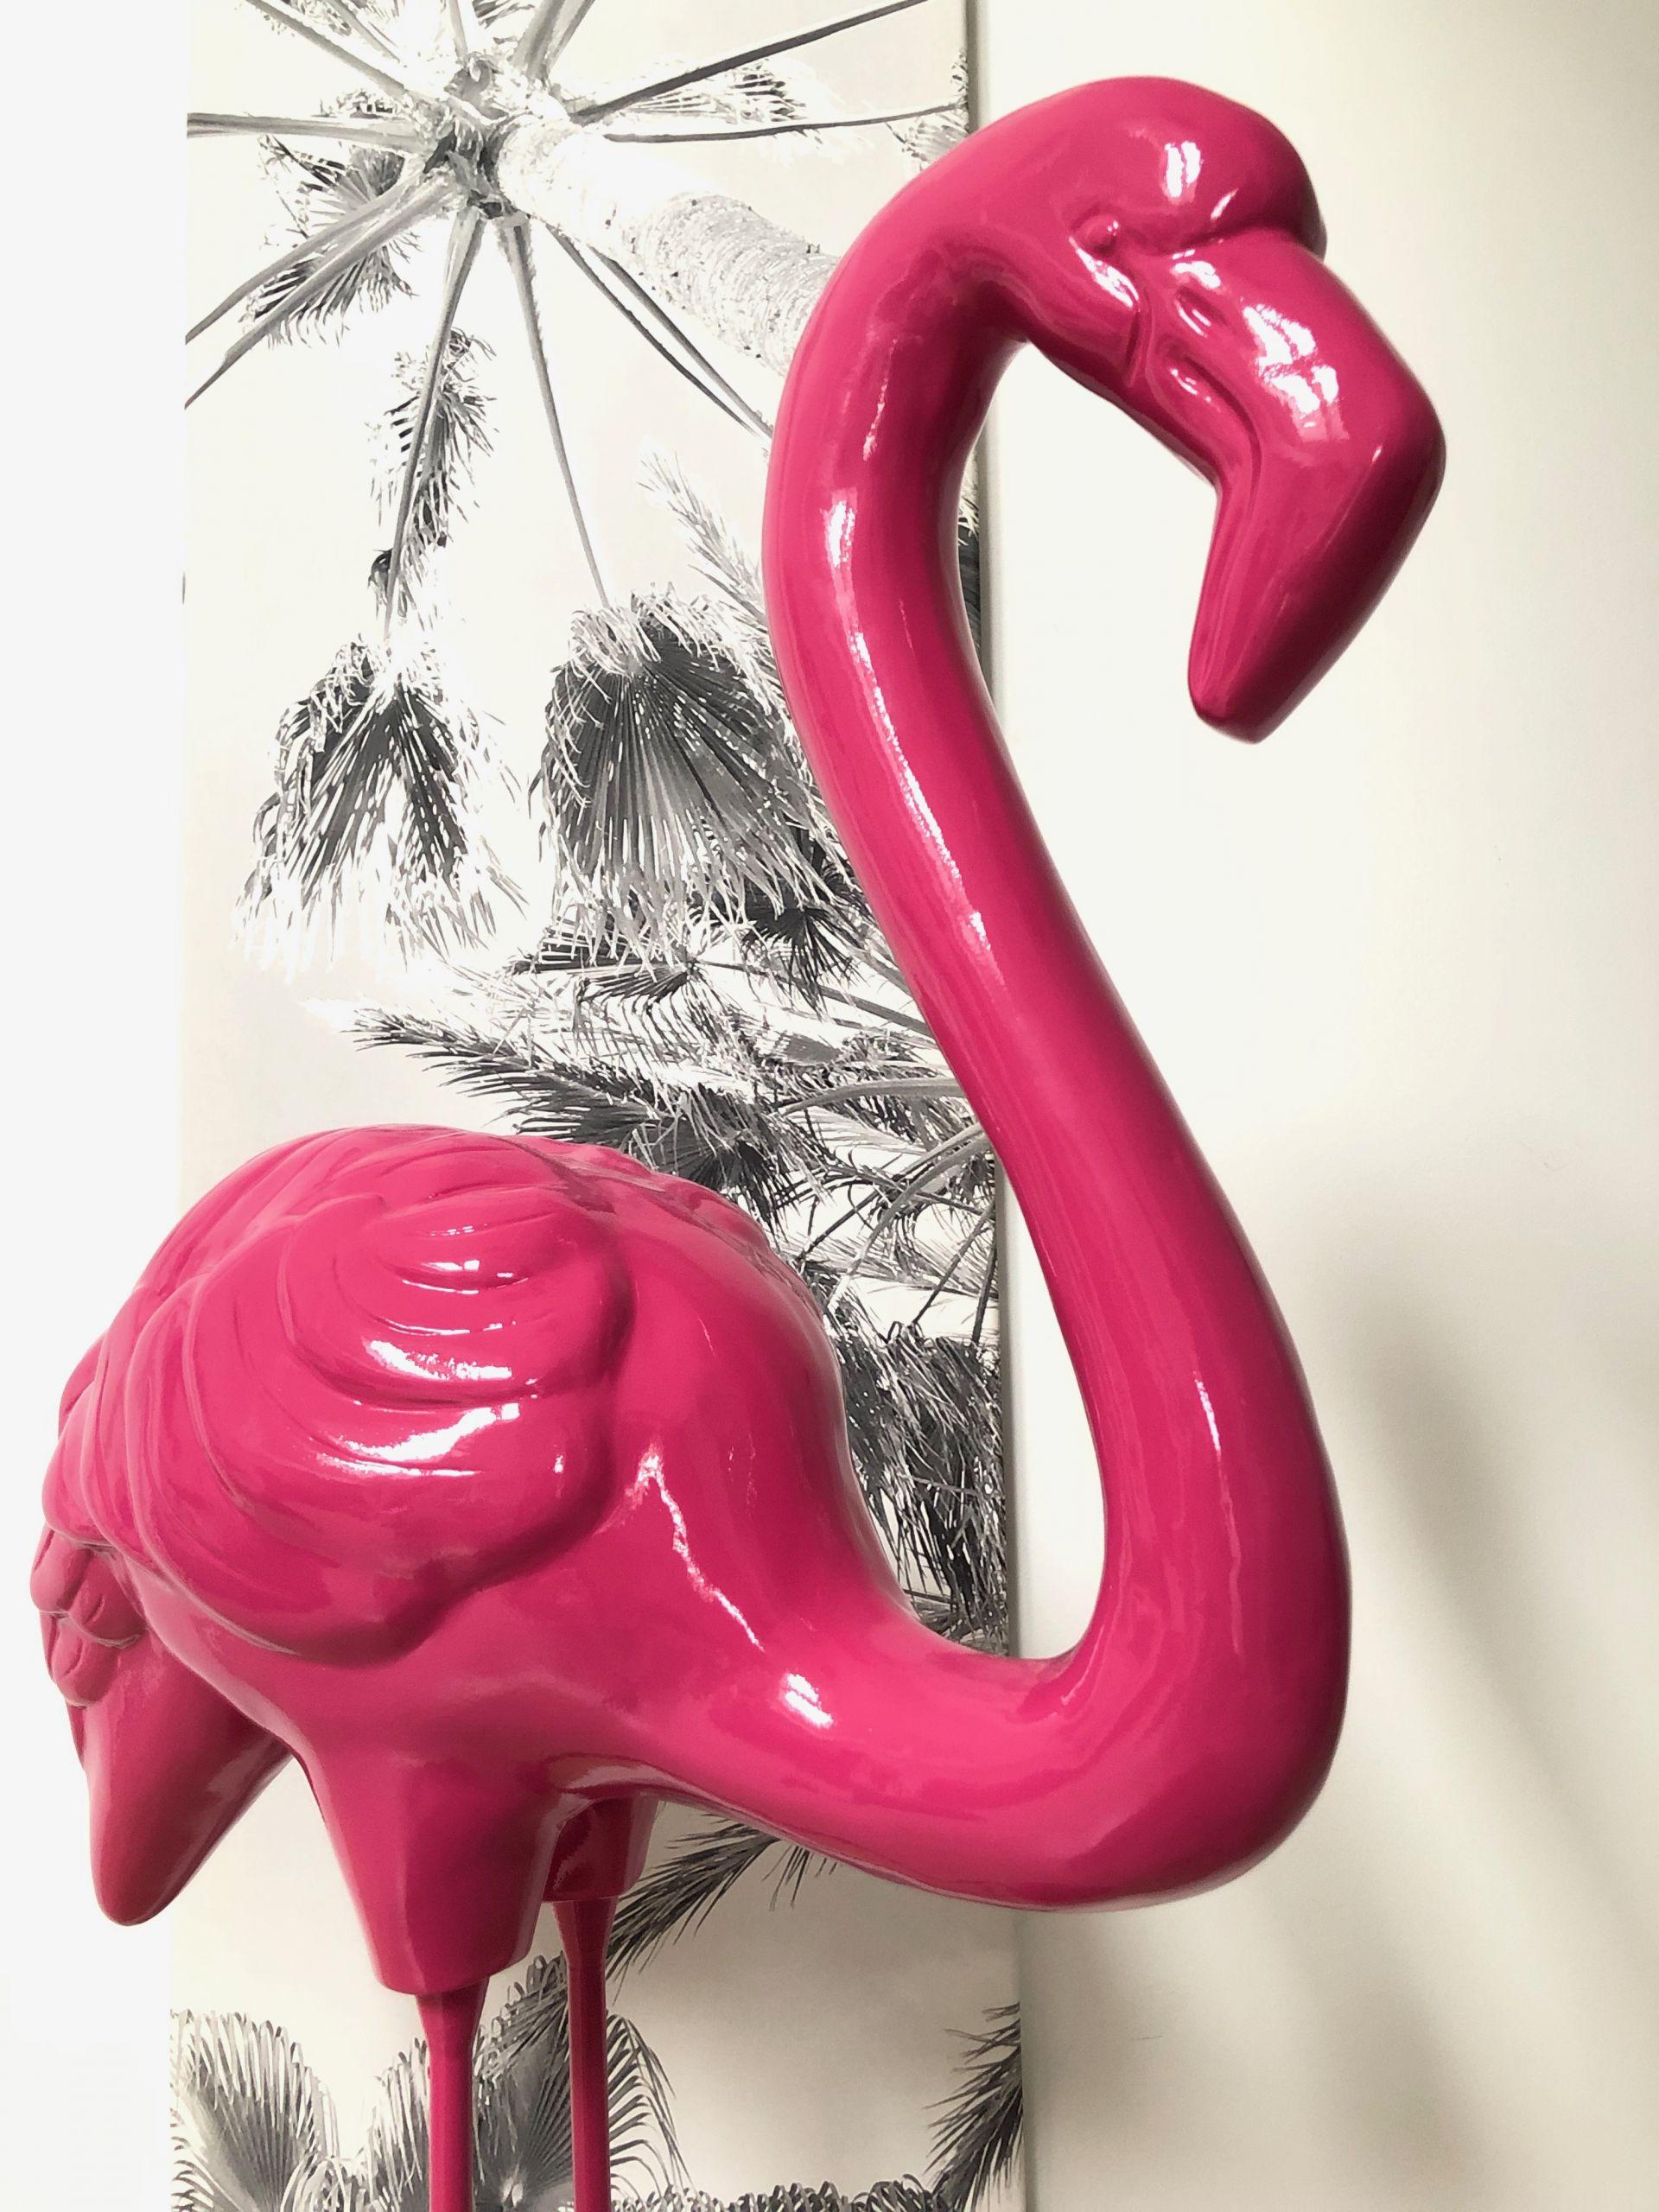 kuhkopf lebensgross wanddekoration designer deko figur hochglanz lack